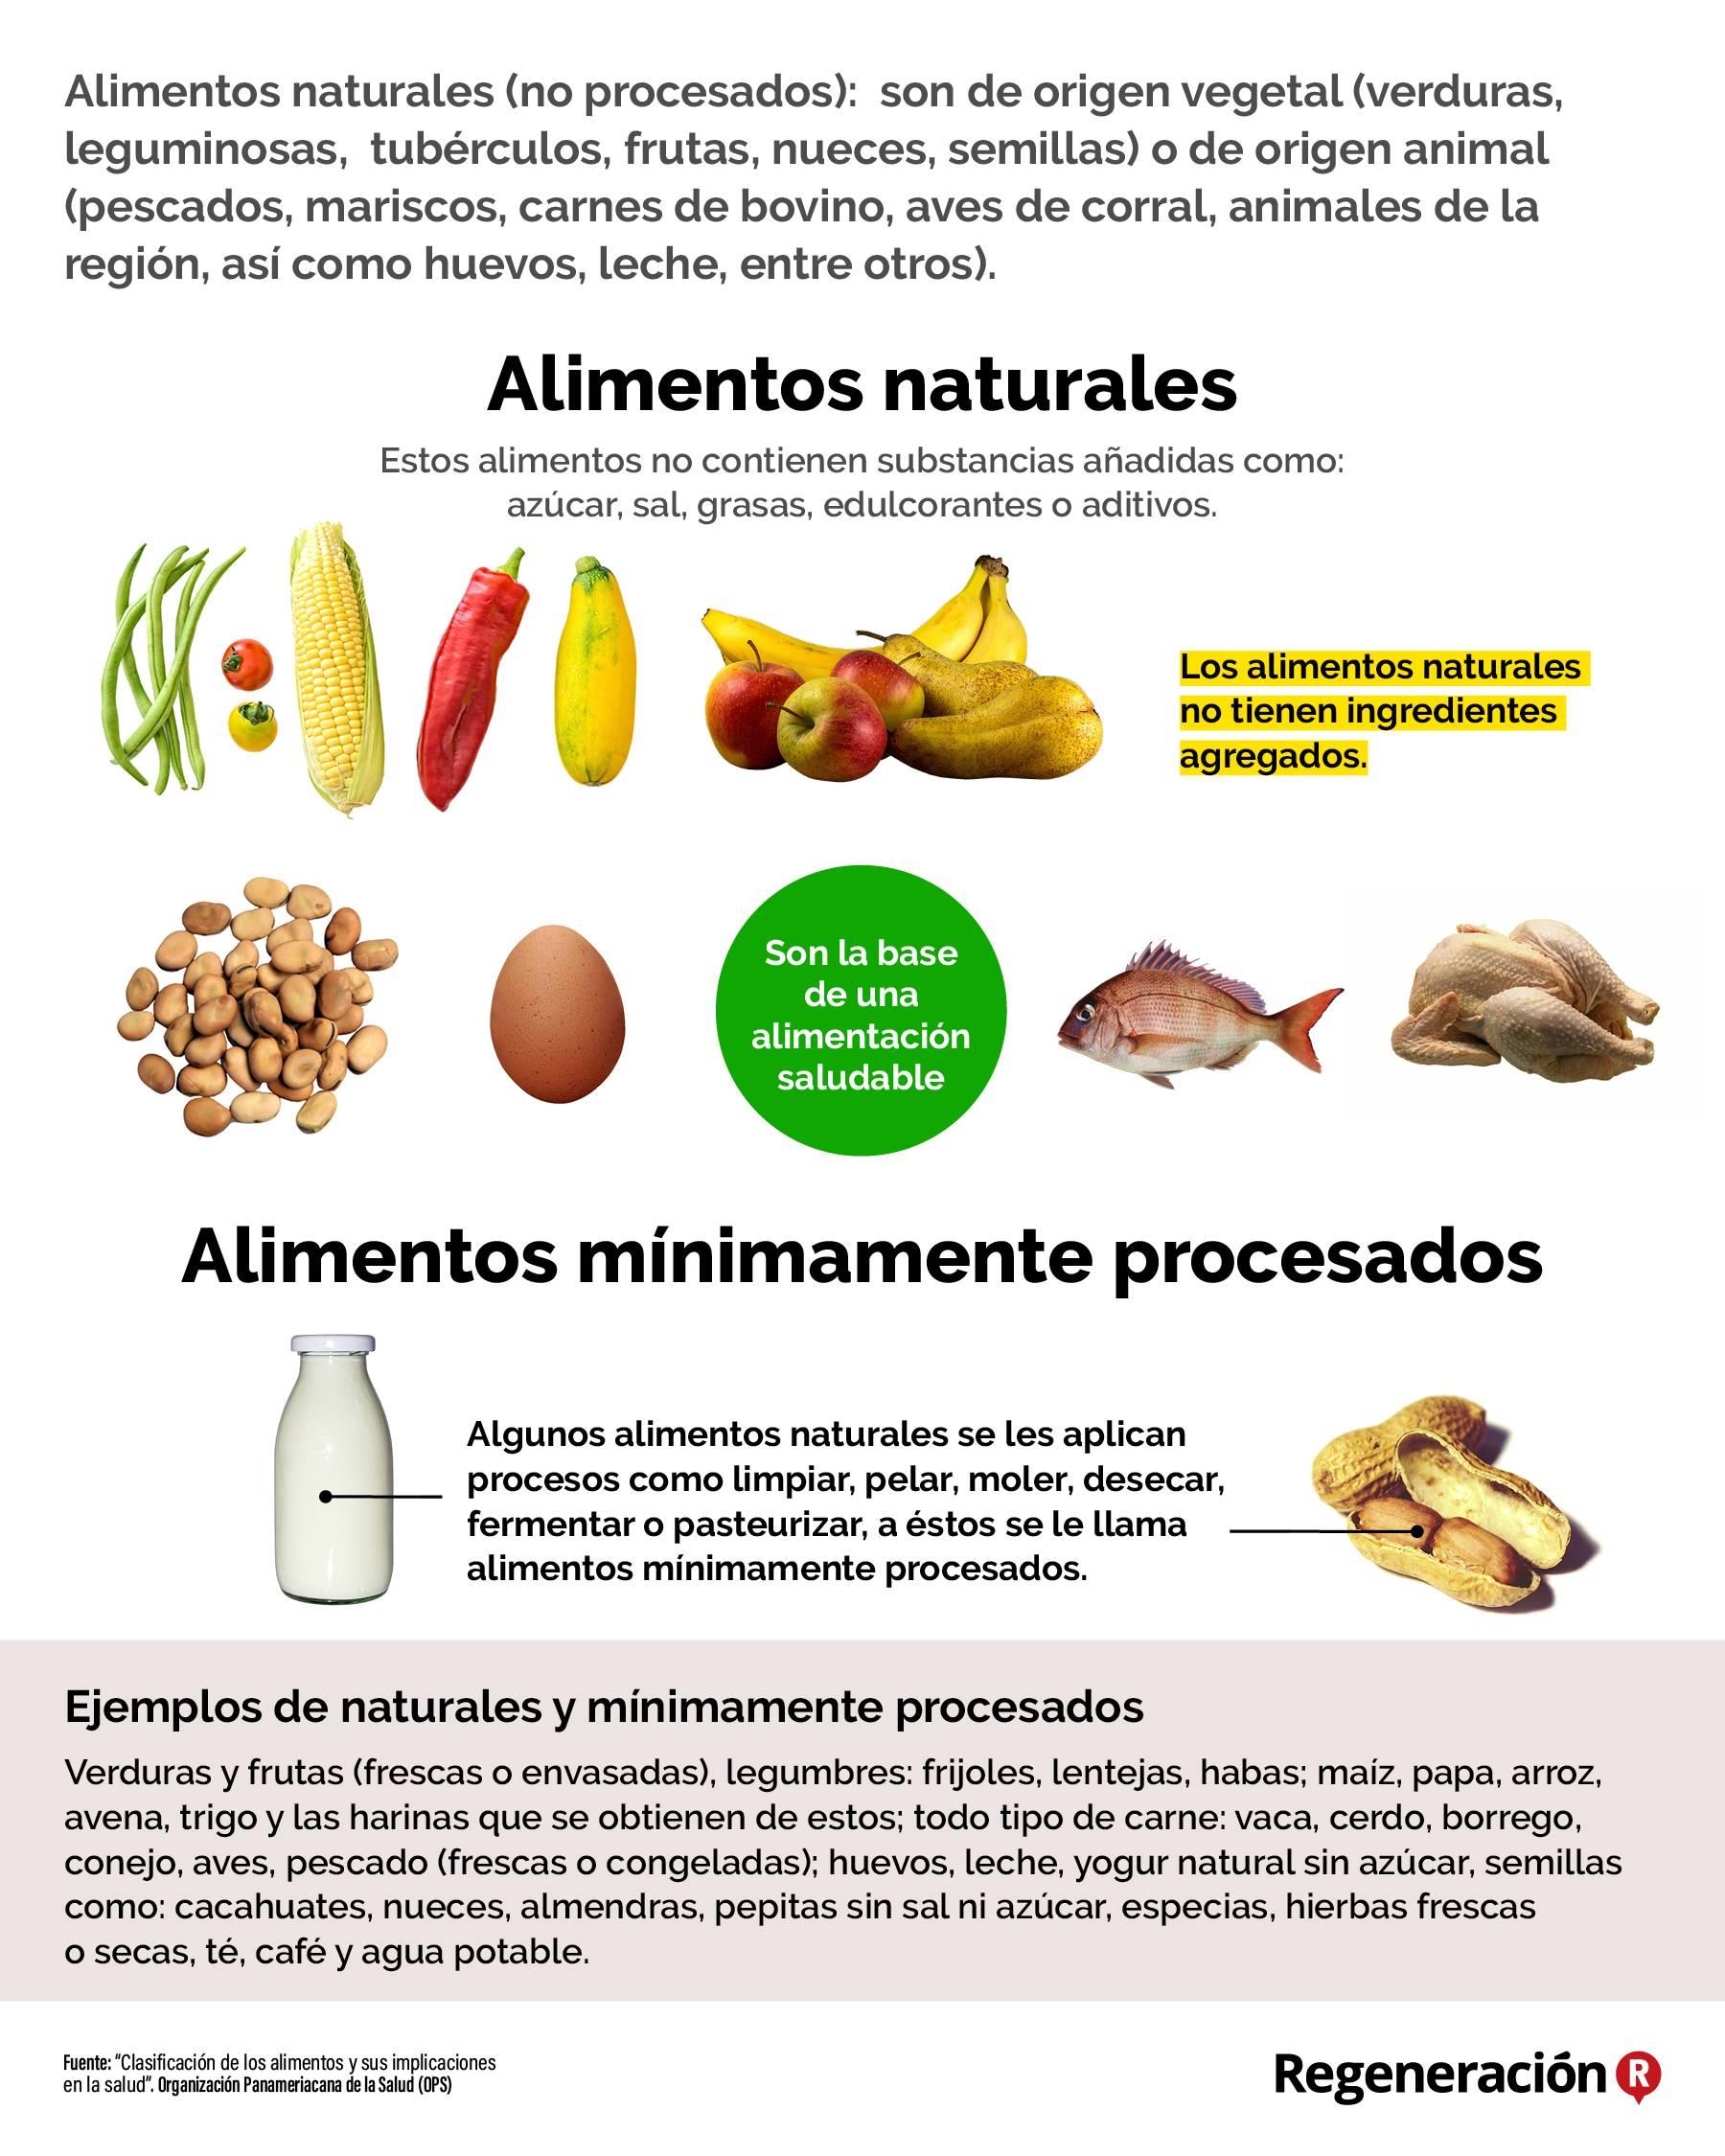 61 Alimentos Afrodisiacos Naturales Para Mujeres 2021 Imagenes